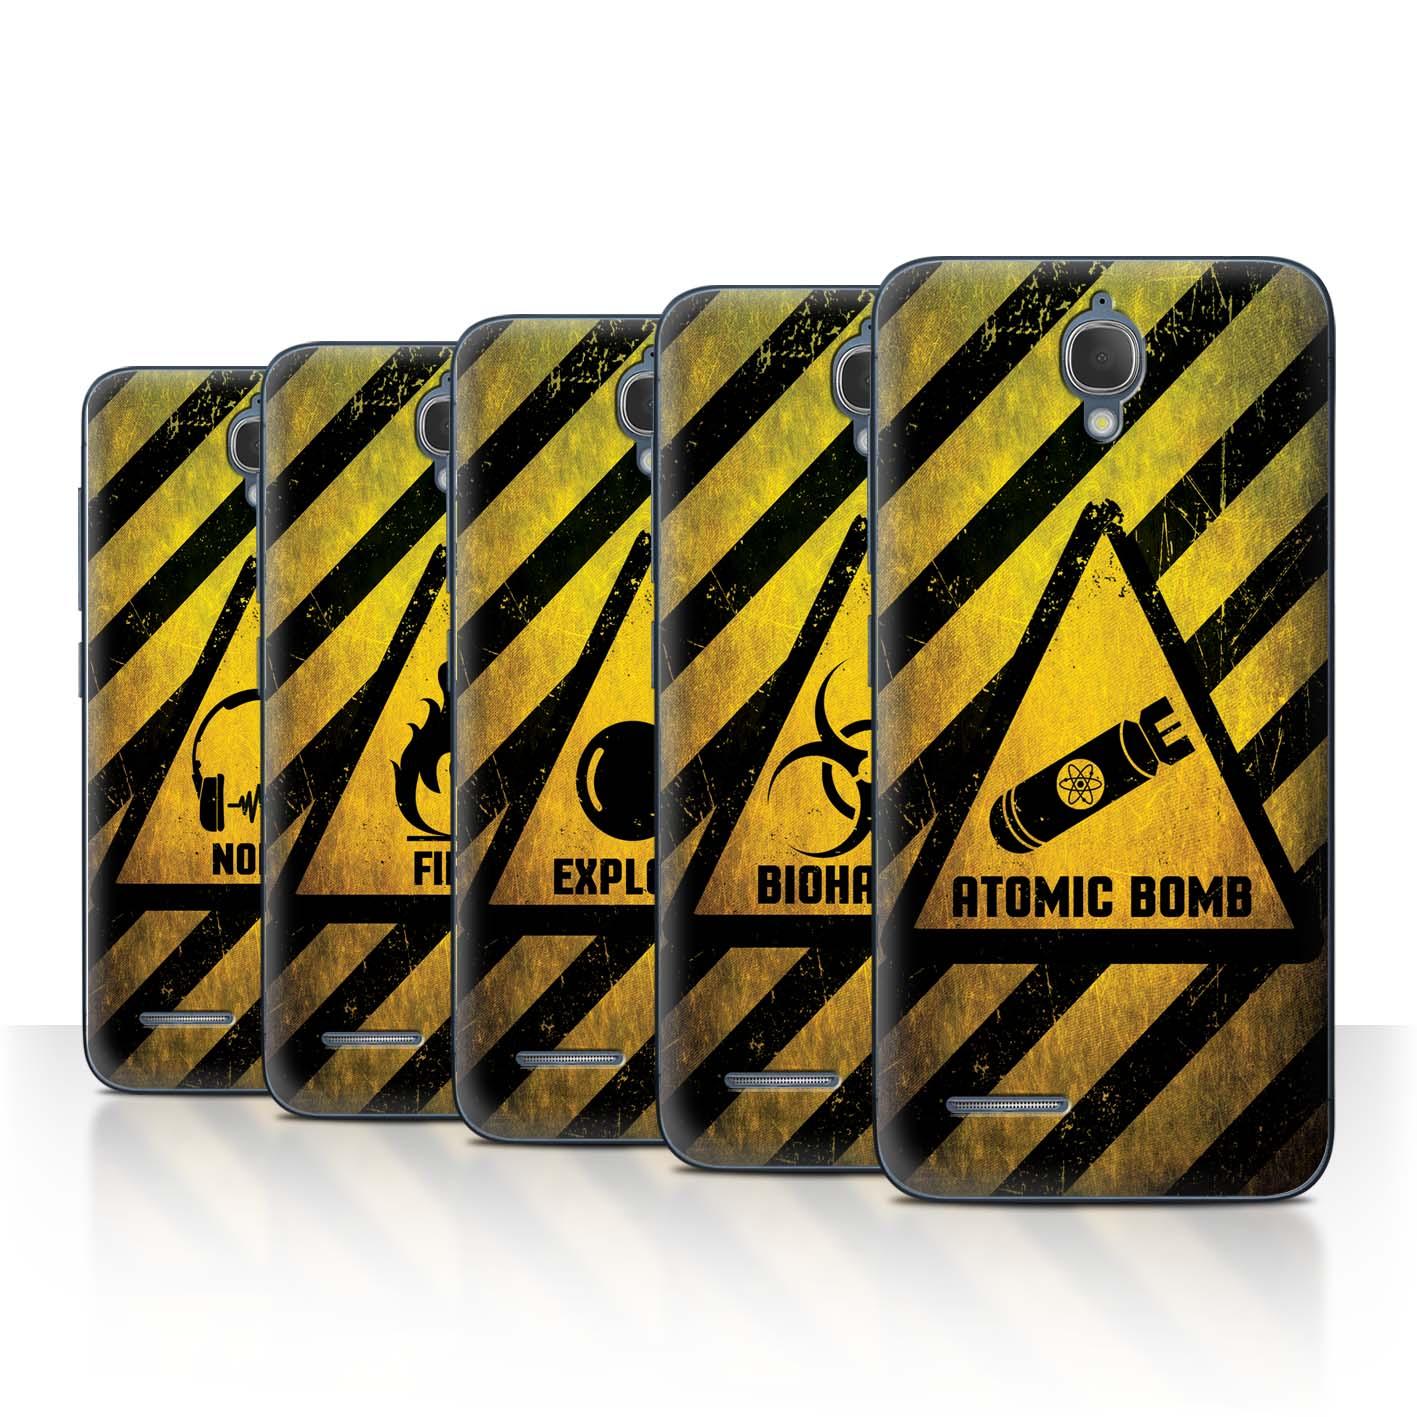 STUFF4-Back-Case-Cover-Skin-for-Alcatel-Idol-2-Mini-Hazard-Warning-Signs